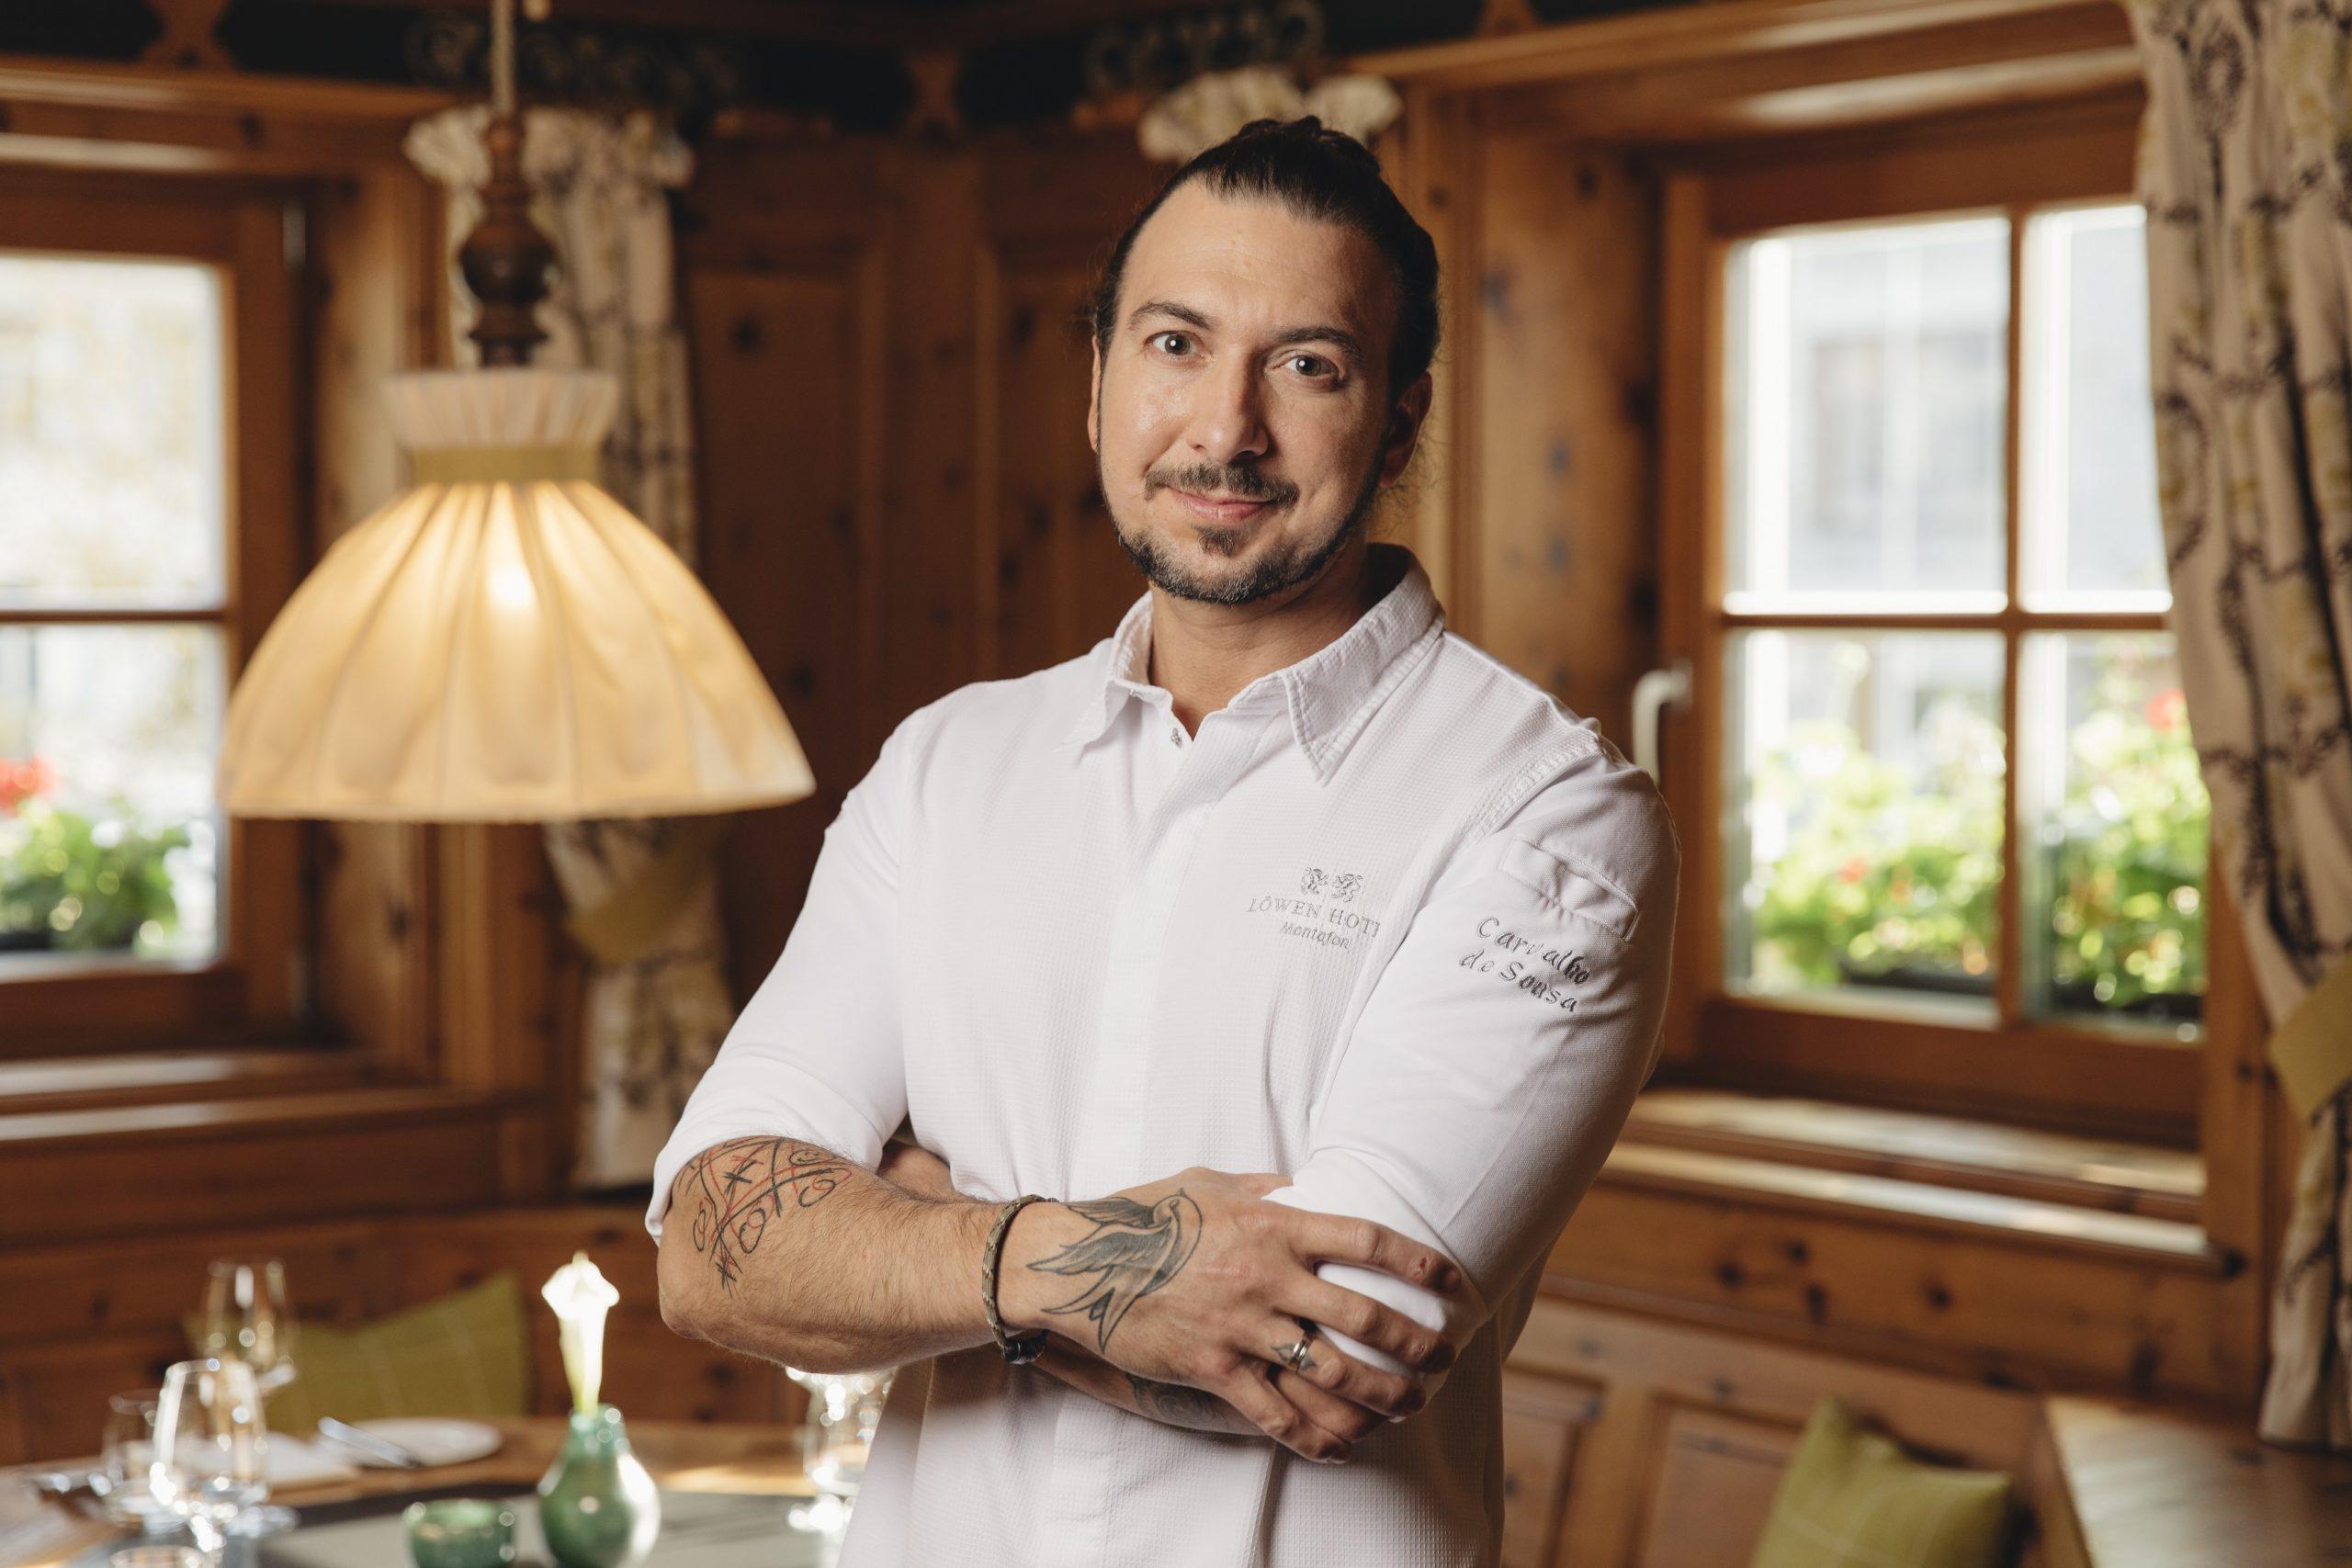 Thomas Carvalho de Sousa, Küchenchef